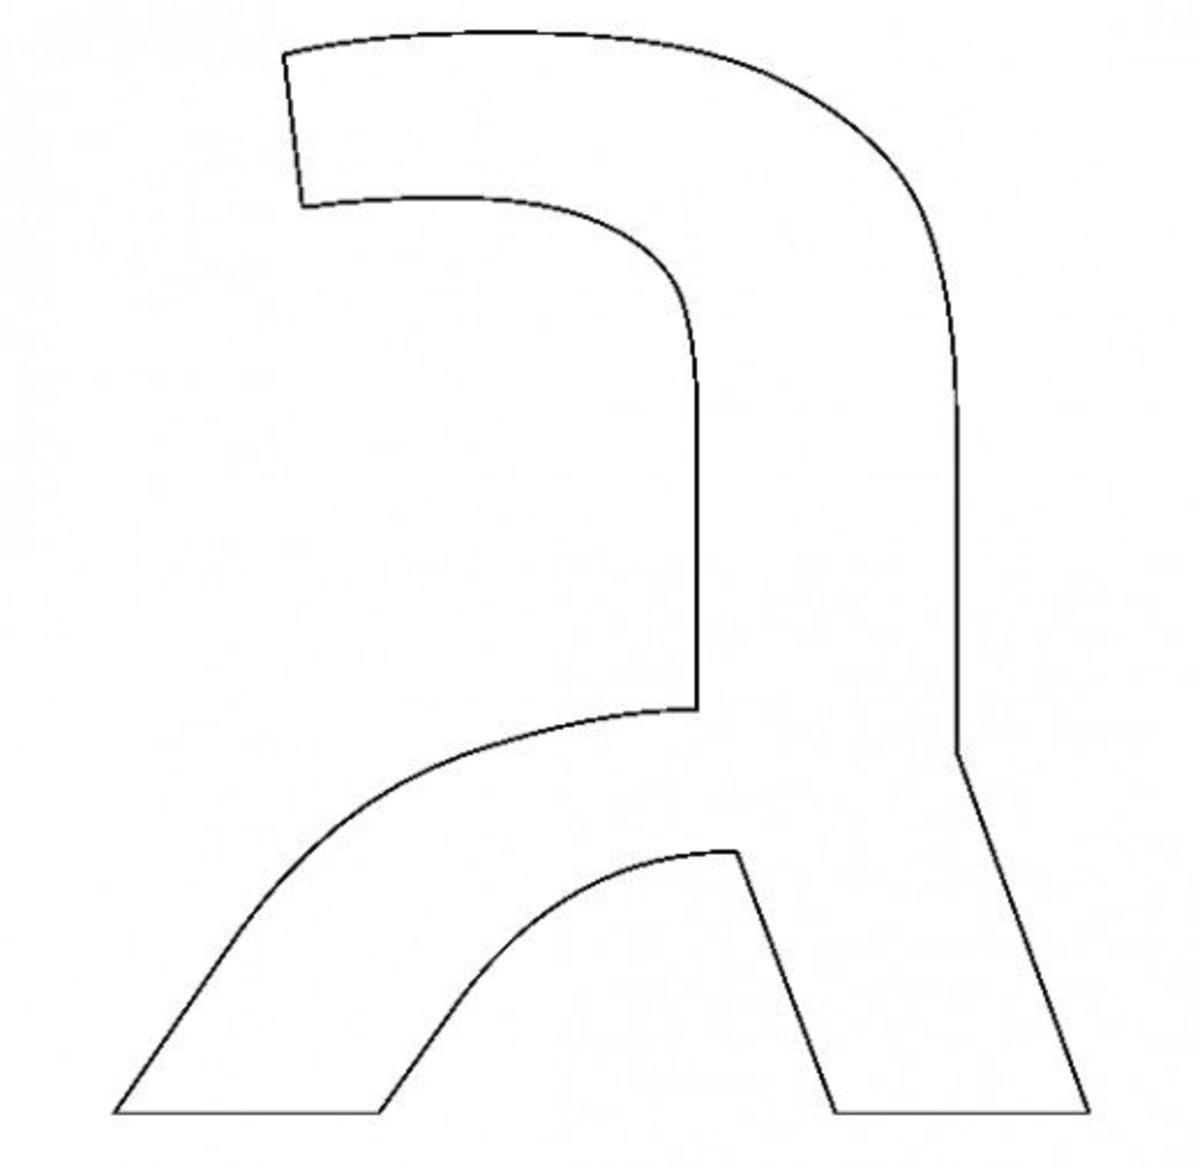 Hebrew Letter Gimel Coloring Page - דף צביעה אוֹת גימל